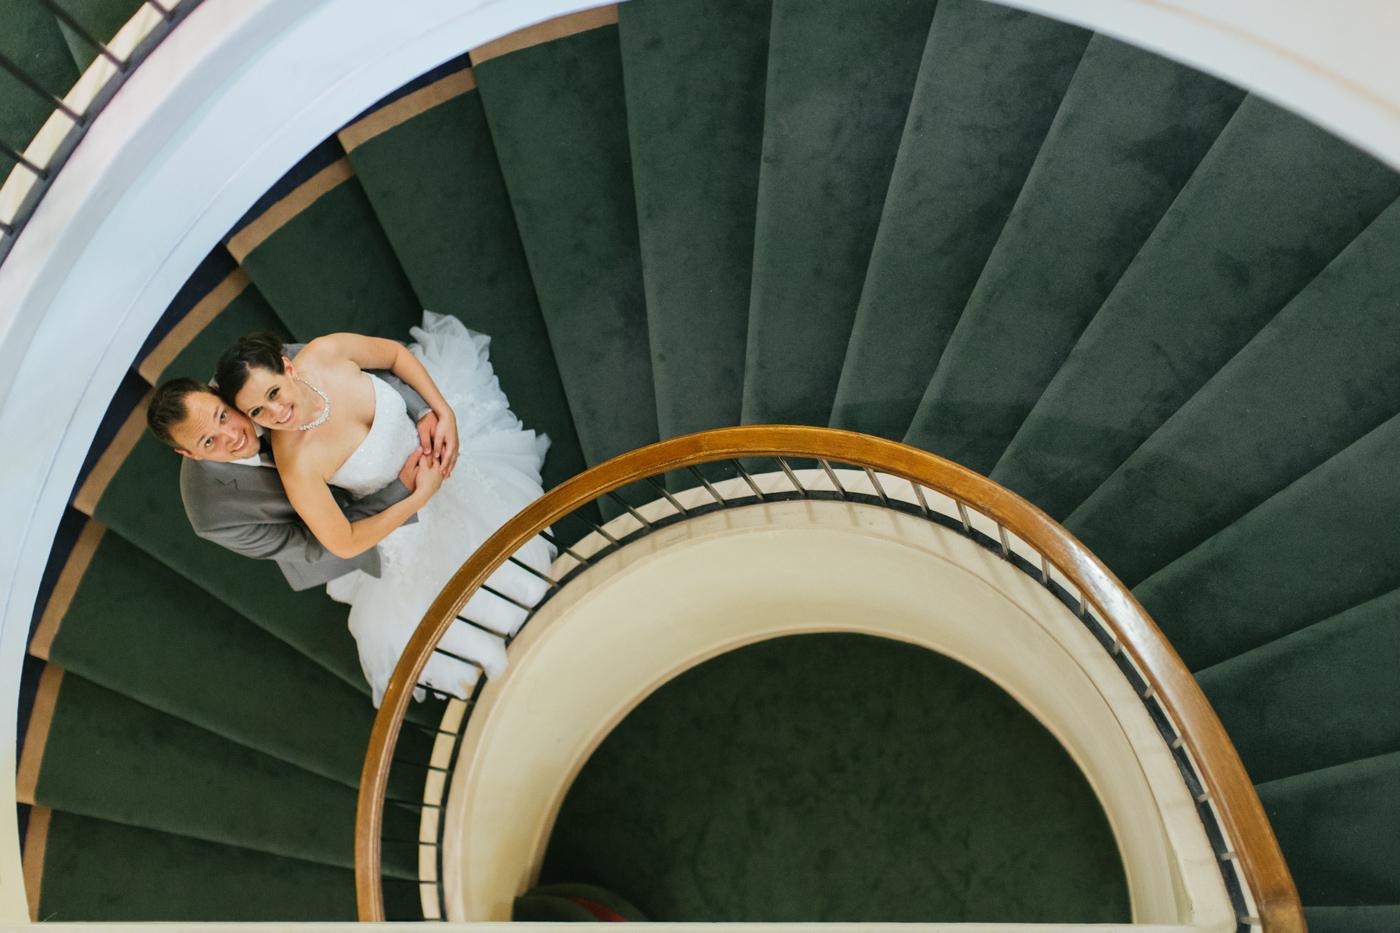 tsakopoulos-library-galleria-wedding-stairwells